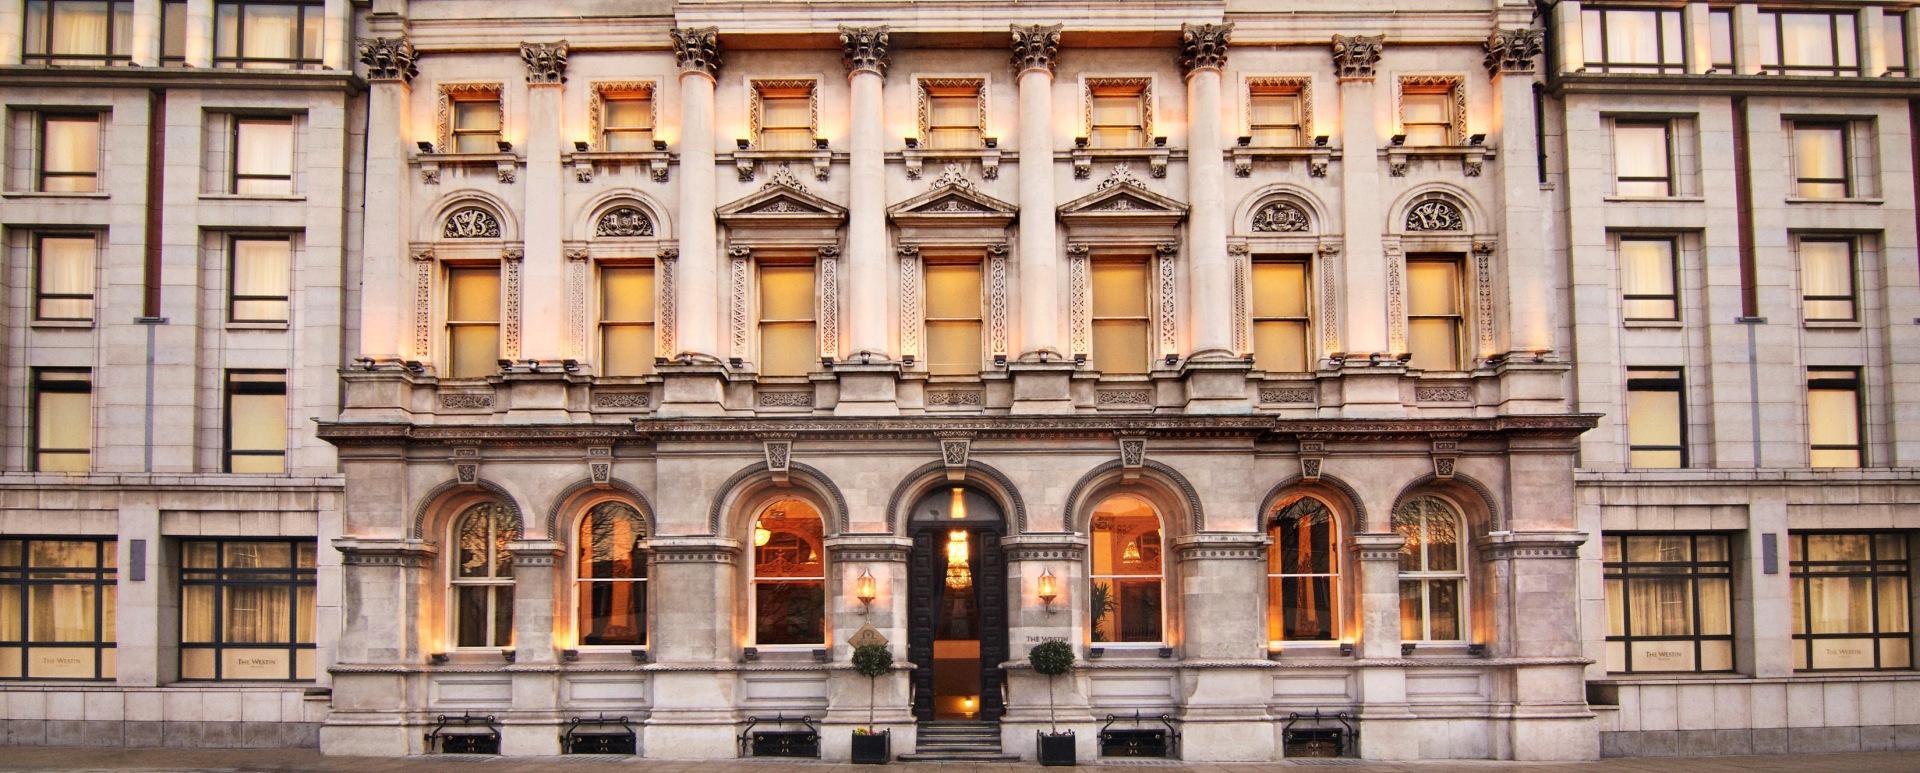 Westin Wedding Hotel Dublin Banking Hall Exterior at Dawn